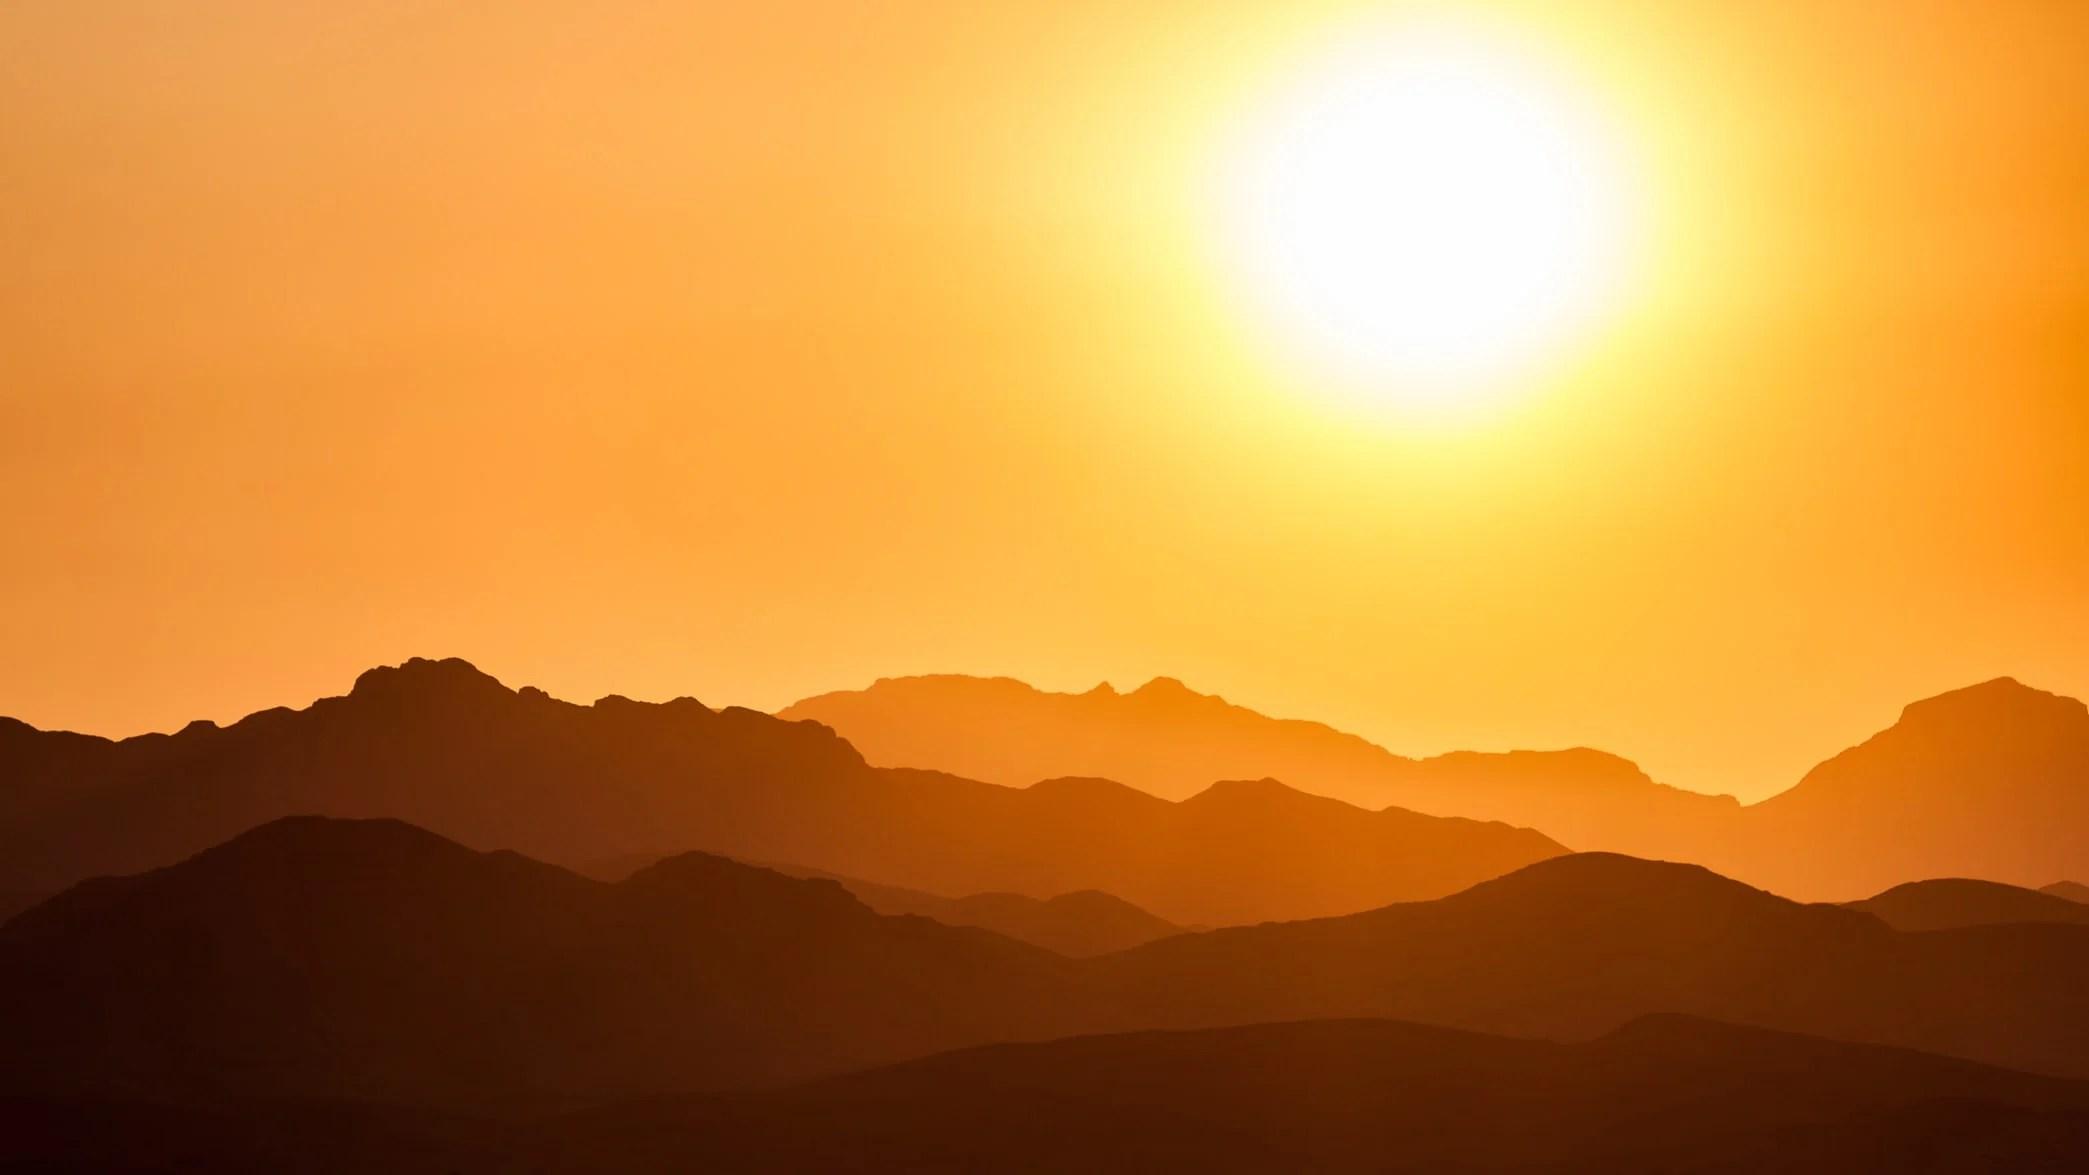 Gebet zum Sonnenaufgang